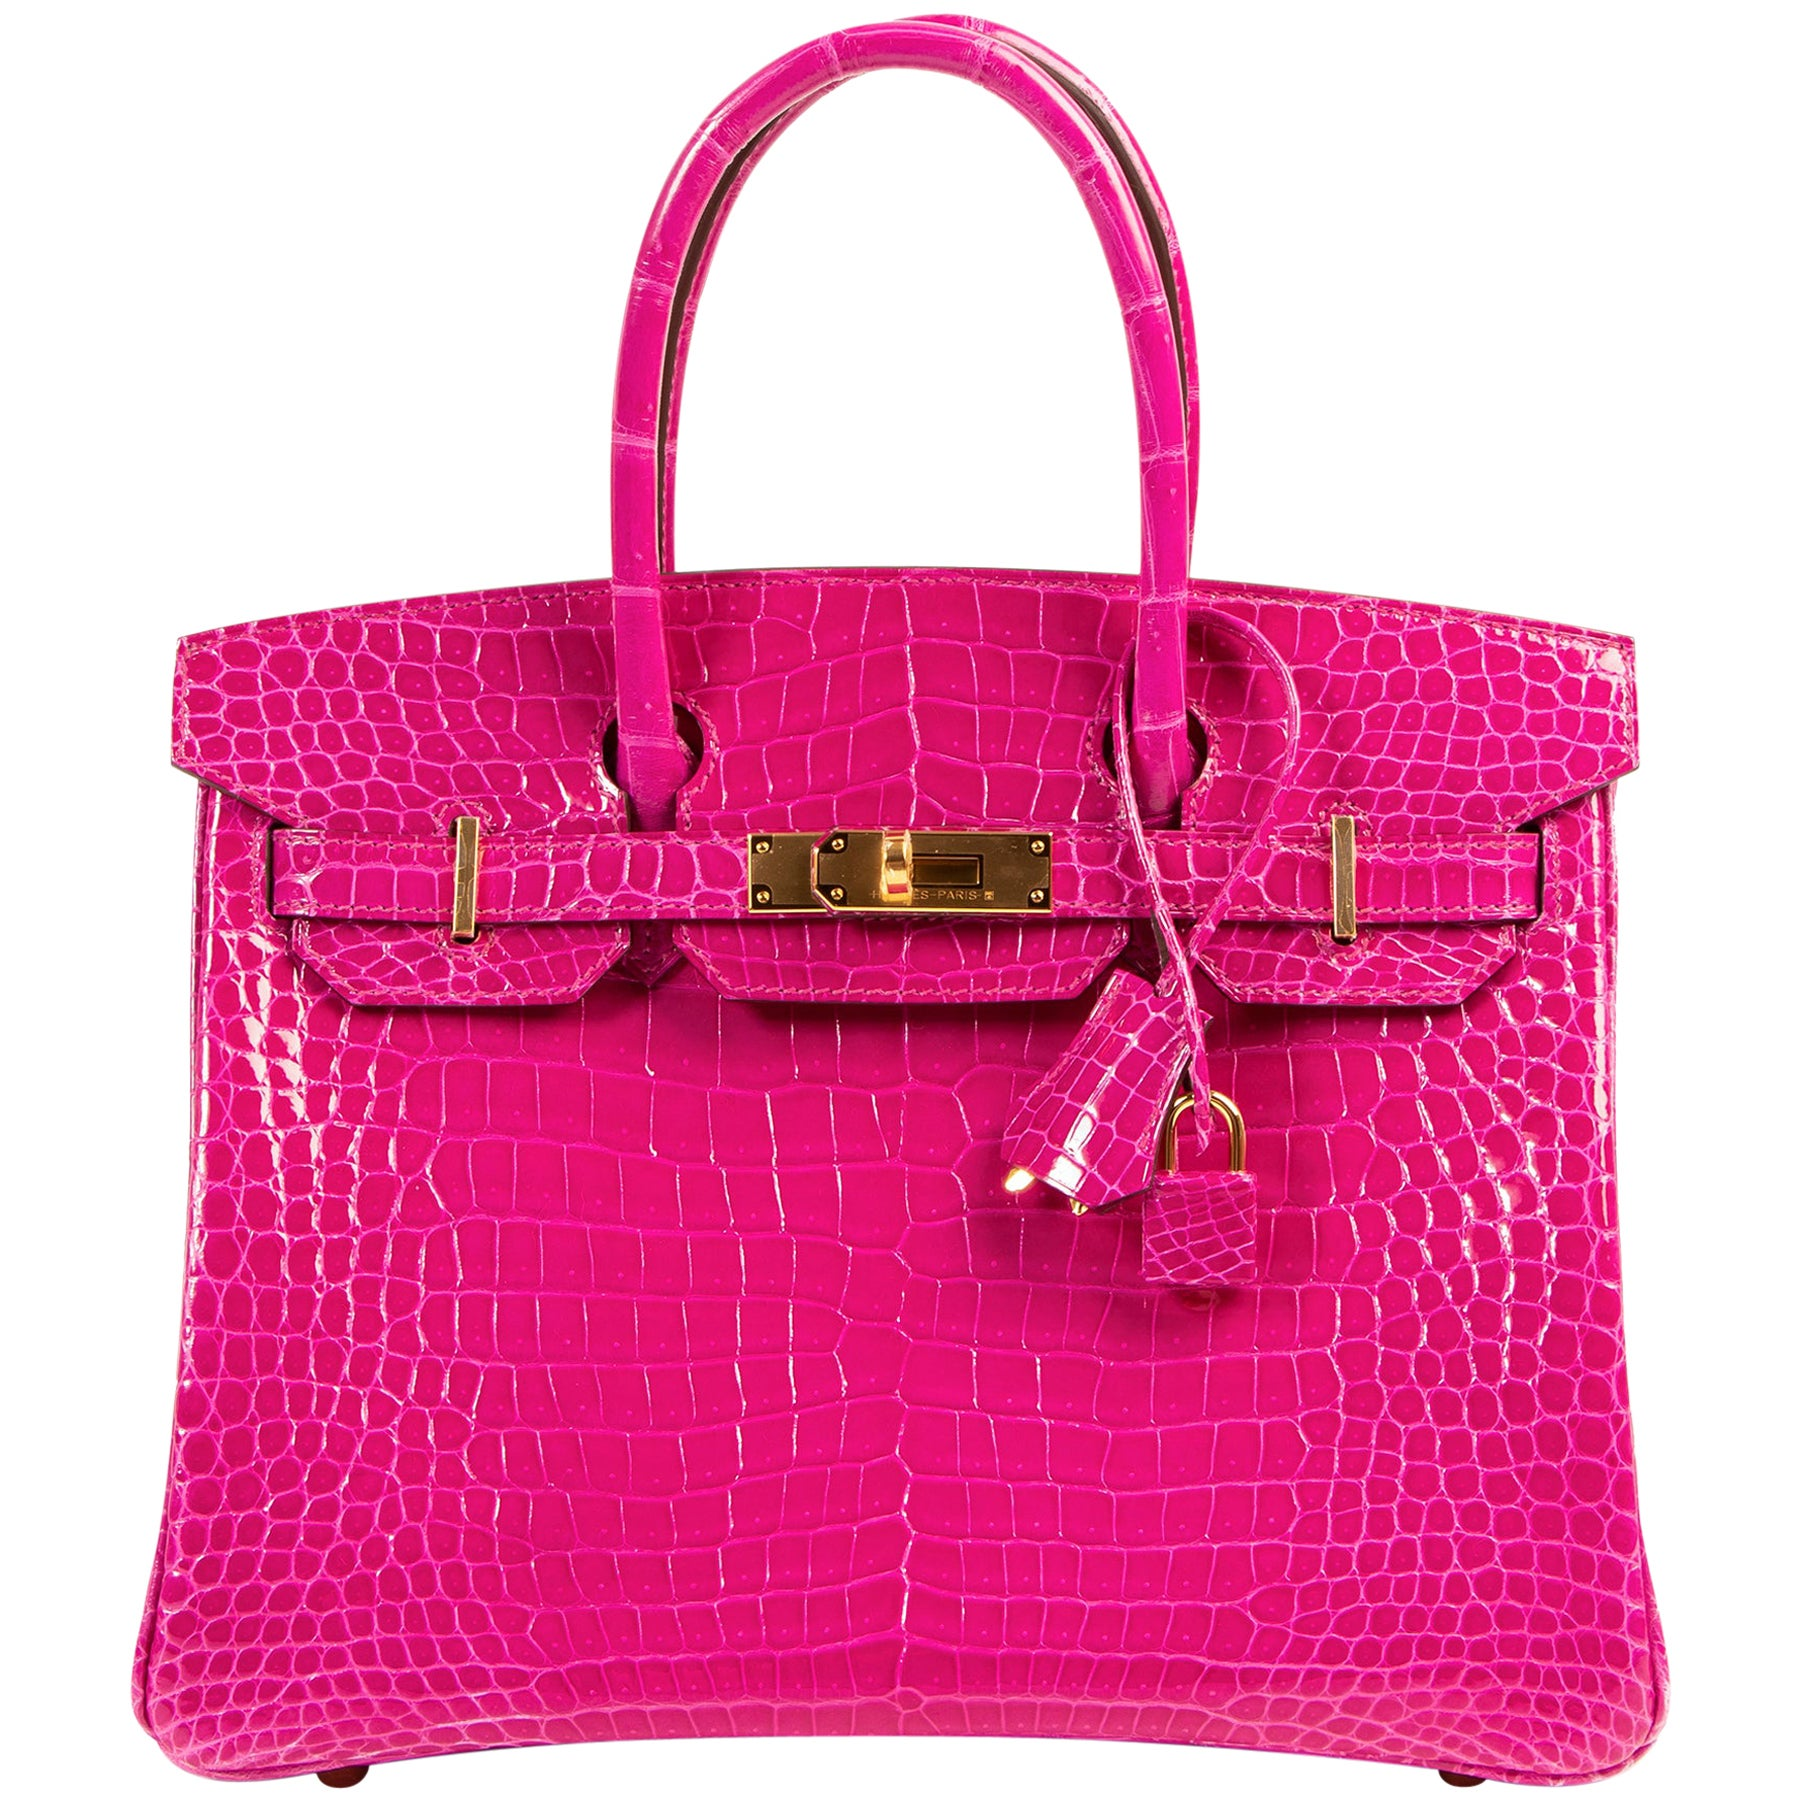 BRAND NEW Hermès Birkin 30 Crocodile Porosus Lisse Rose Sheherazade GHW